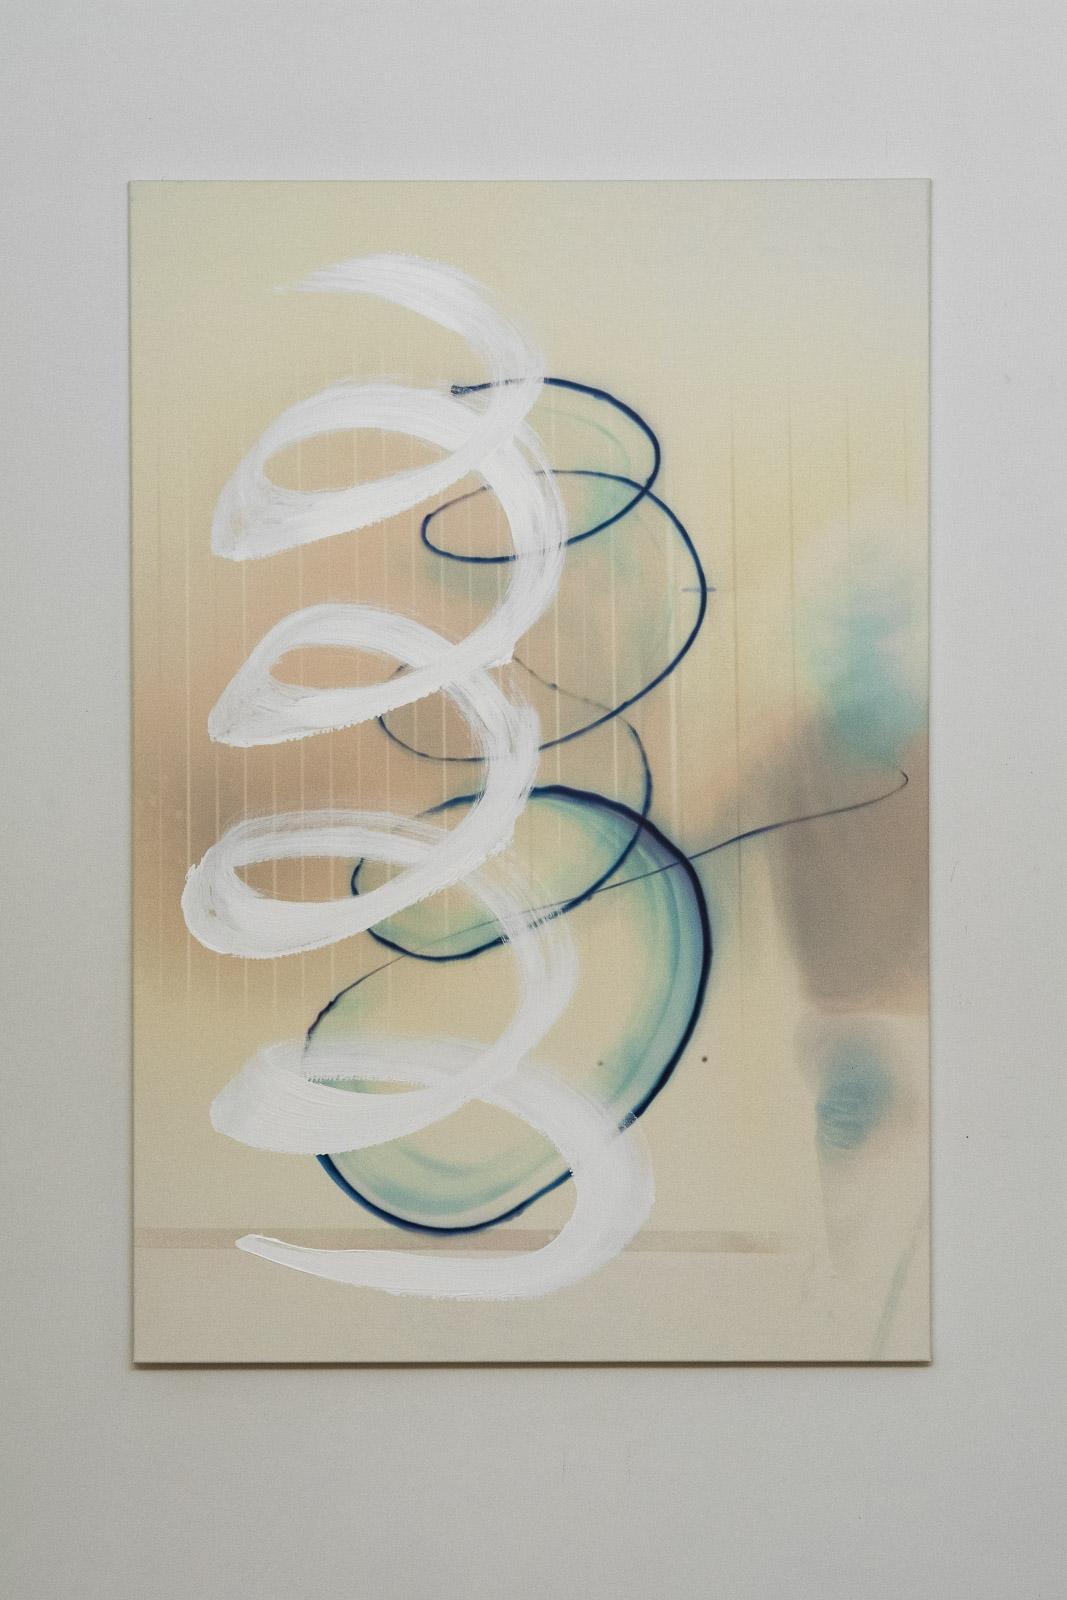 Marijke van Warmerdam, Speedy Spiral, 2009, Acrylic paint, inkjet print on canvas, 200 x 135 cm